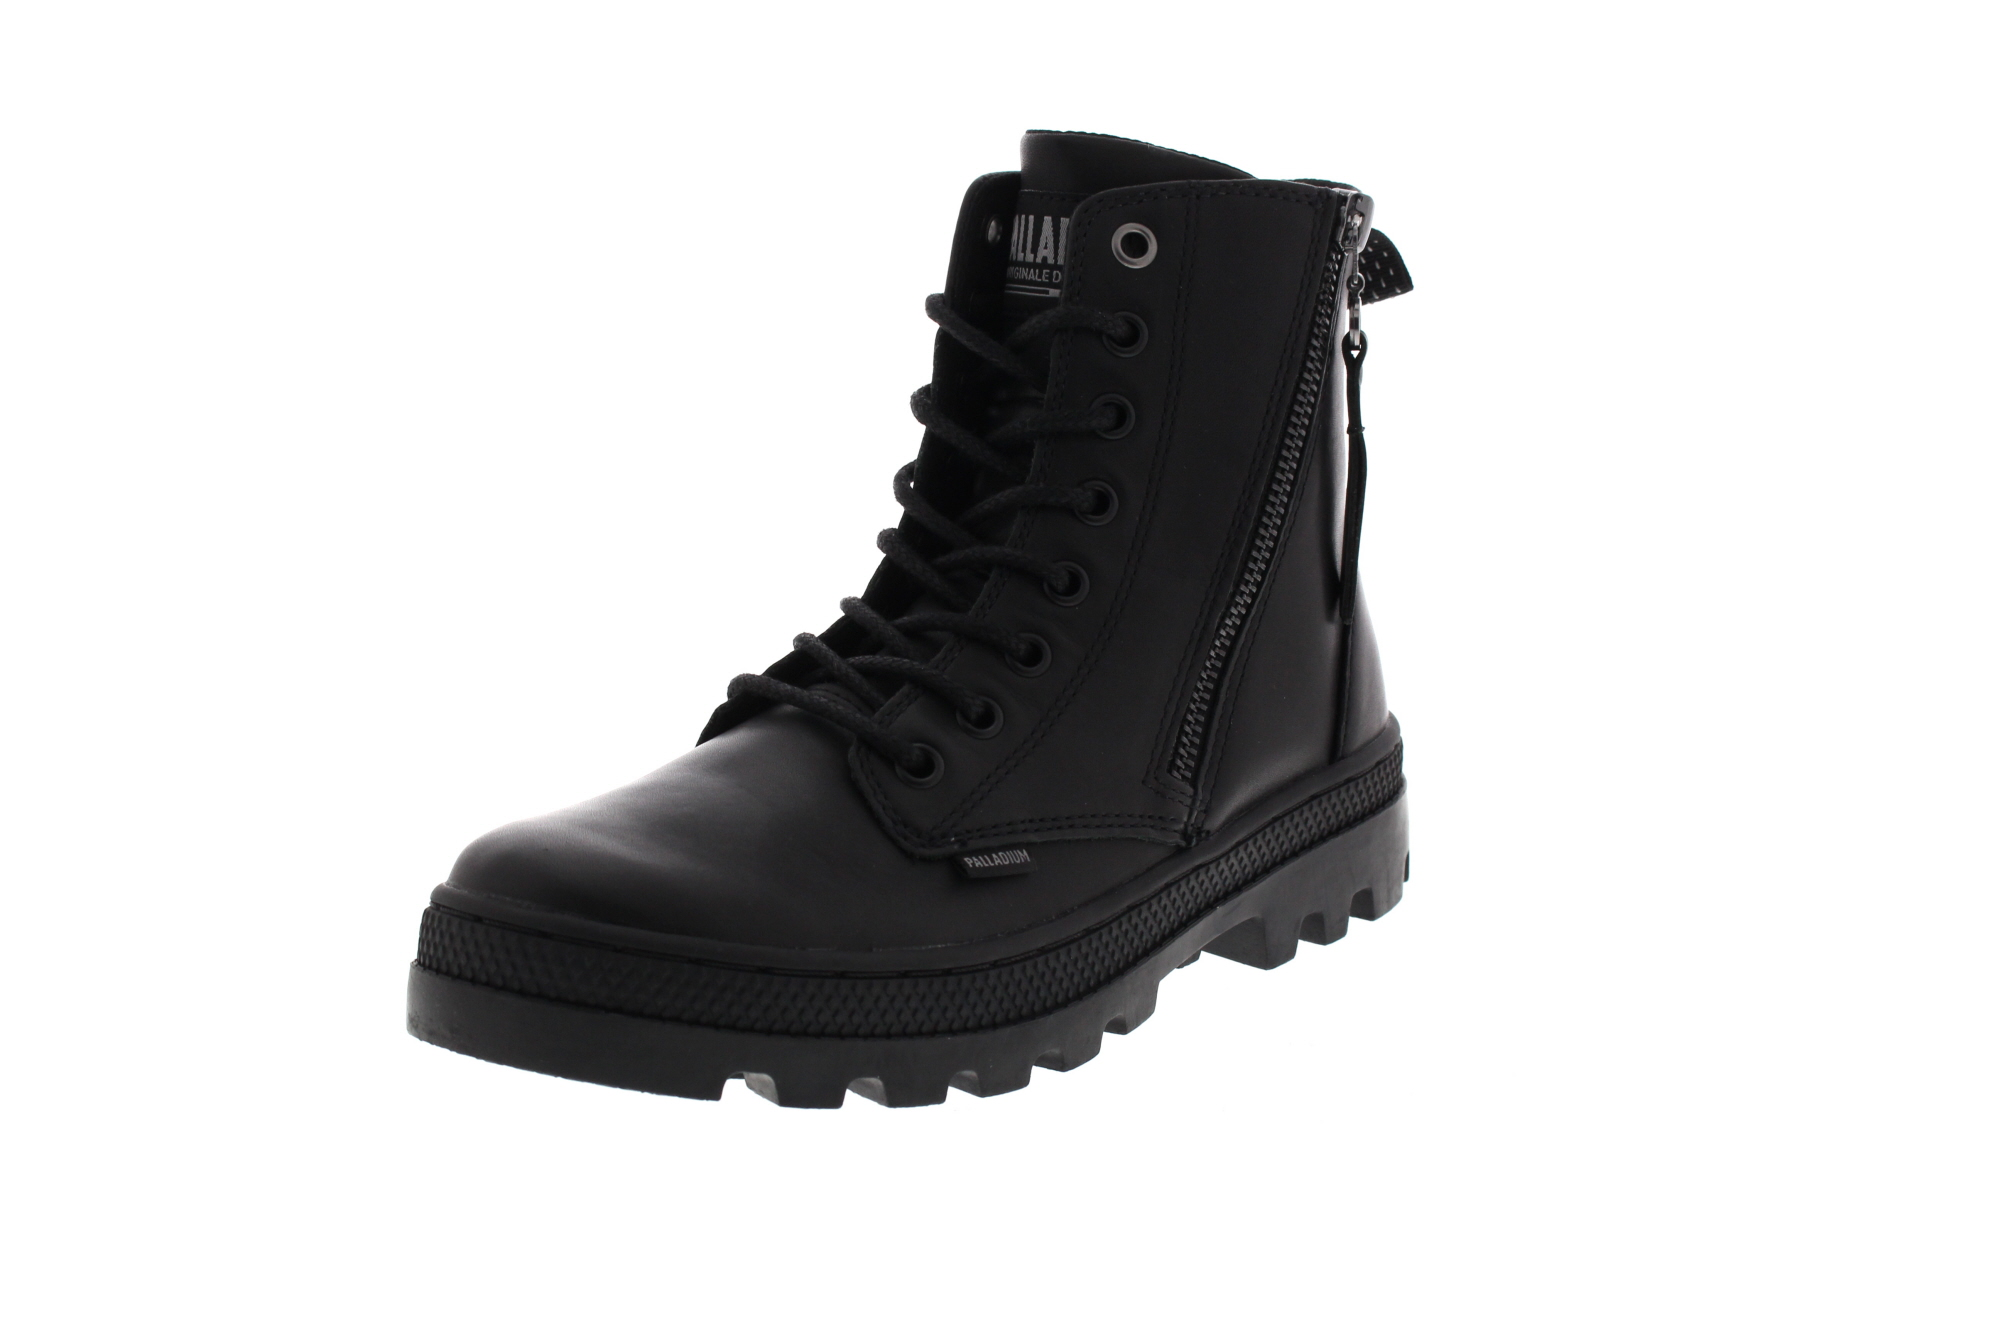 PALLADIUM Damen - Boots PALLABOSSE HI ZIP LTH - black 0-6798